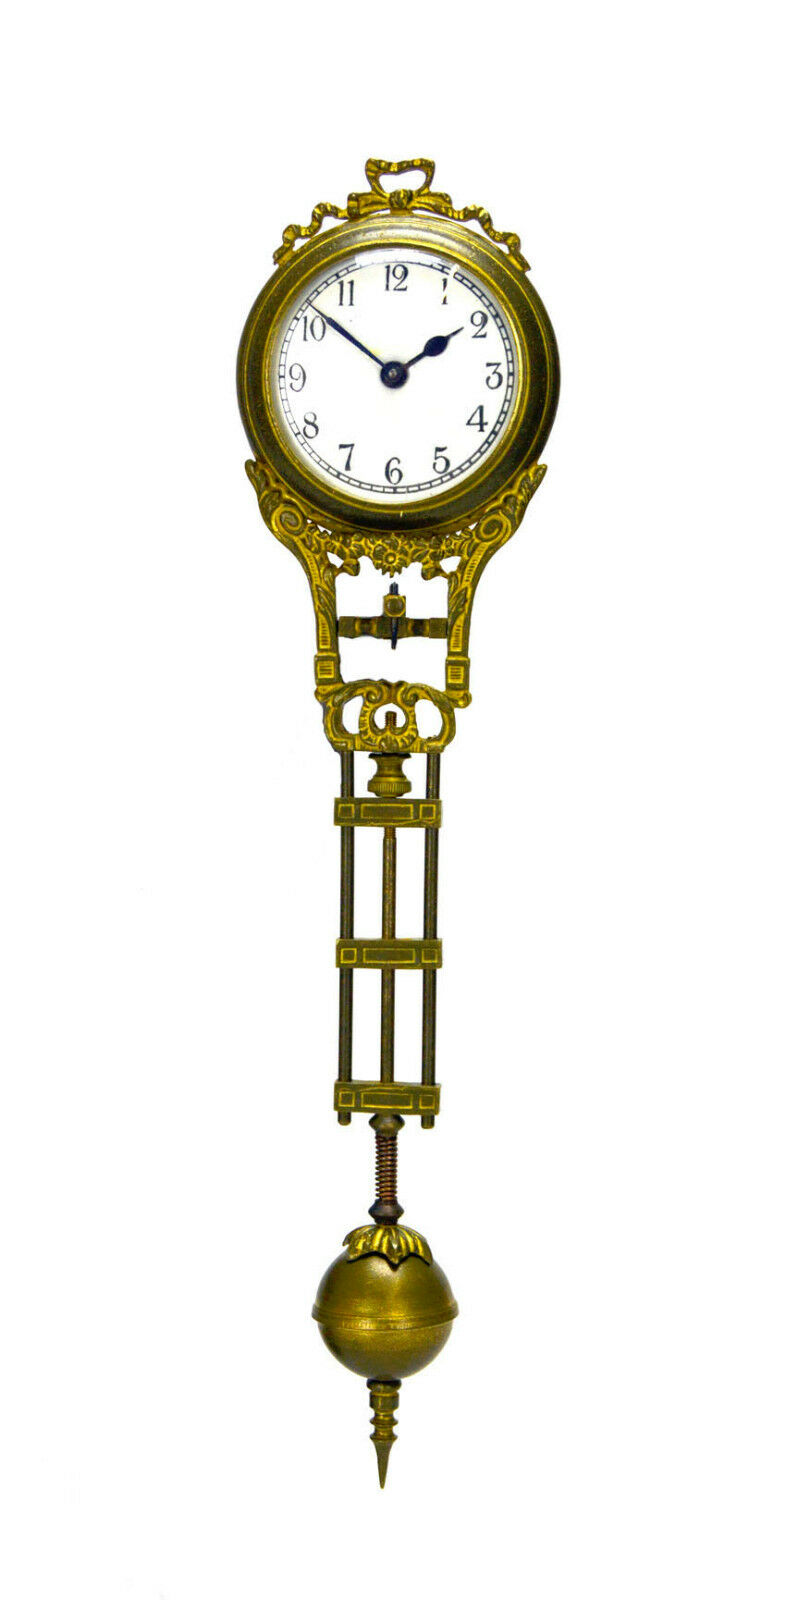 8 DAY Movement Center Arbor SWINGING CLOCK ARM for German Junghans Swinger